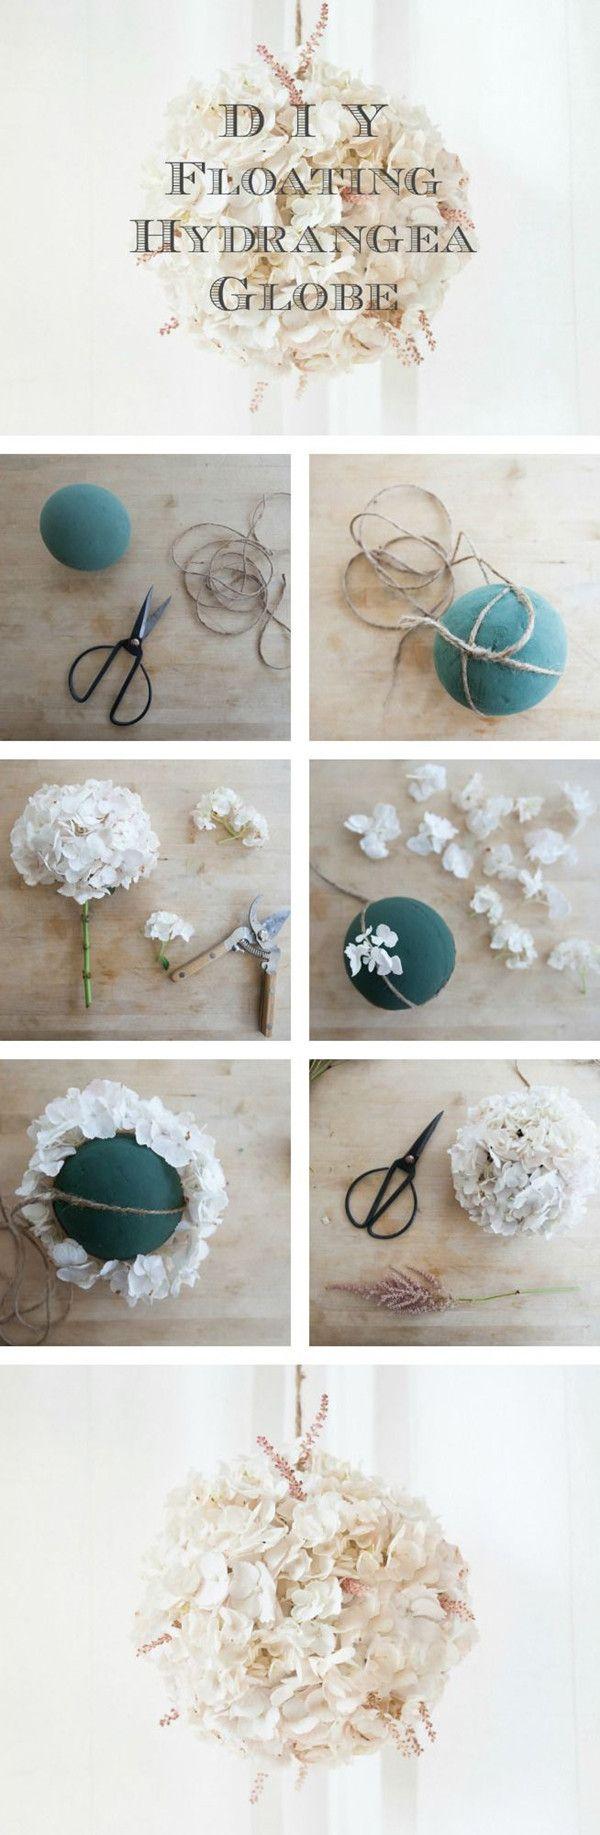 141 best DIY Wedding Ideas images on Pinterest | Card wedding, Diy ...